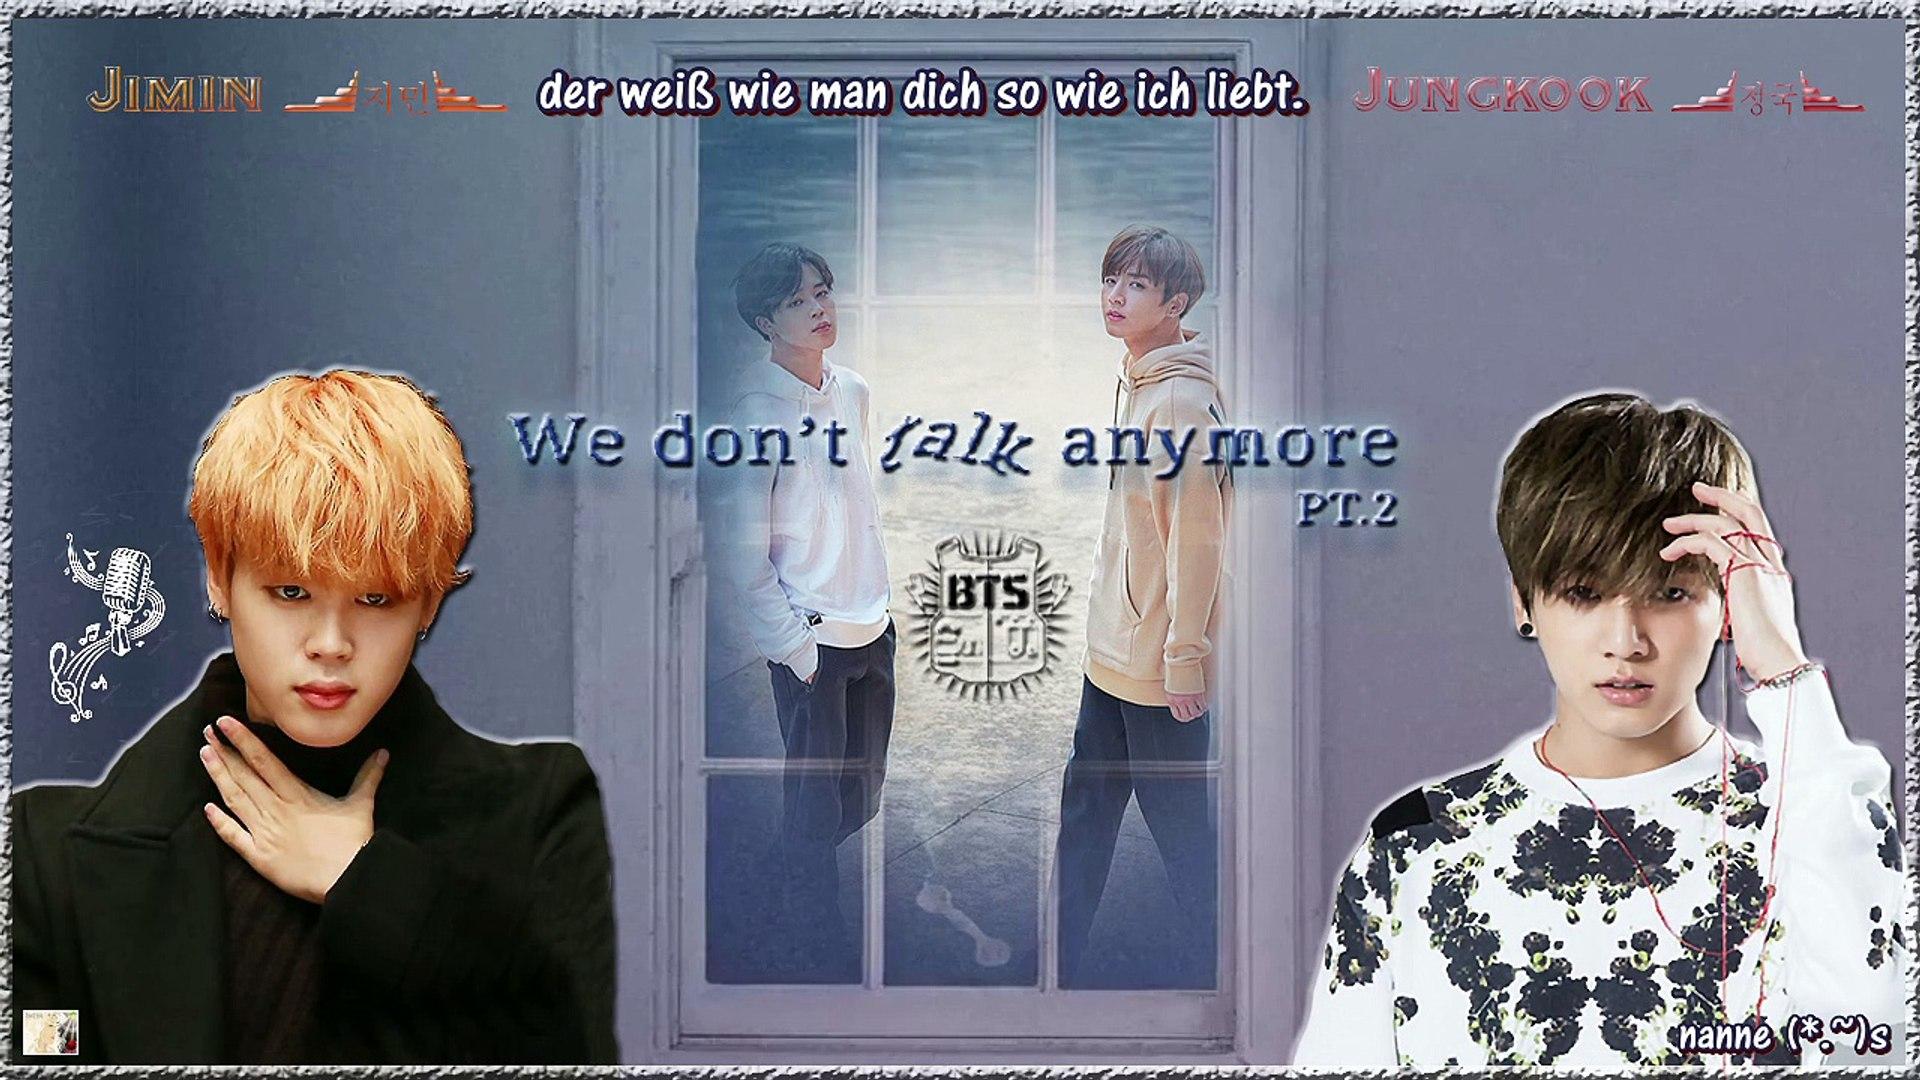 Jungkook Jimin Of Bts We Don T Talk Anymore Pt 2 German